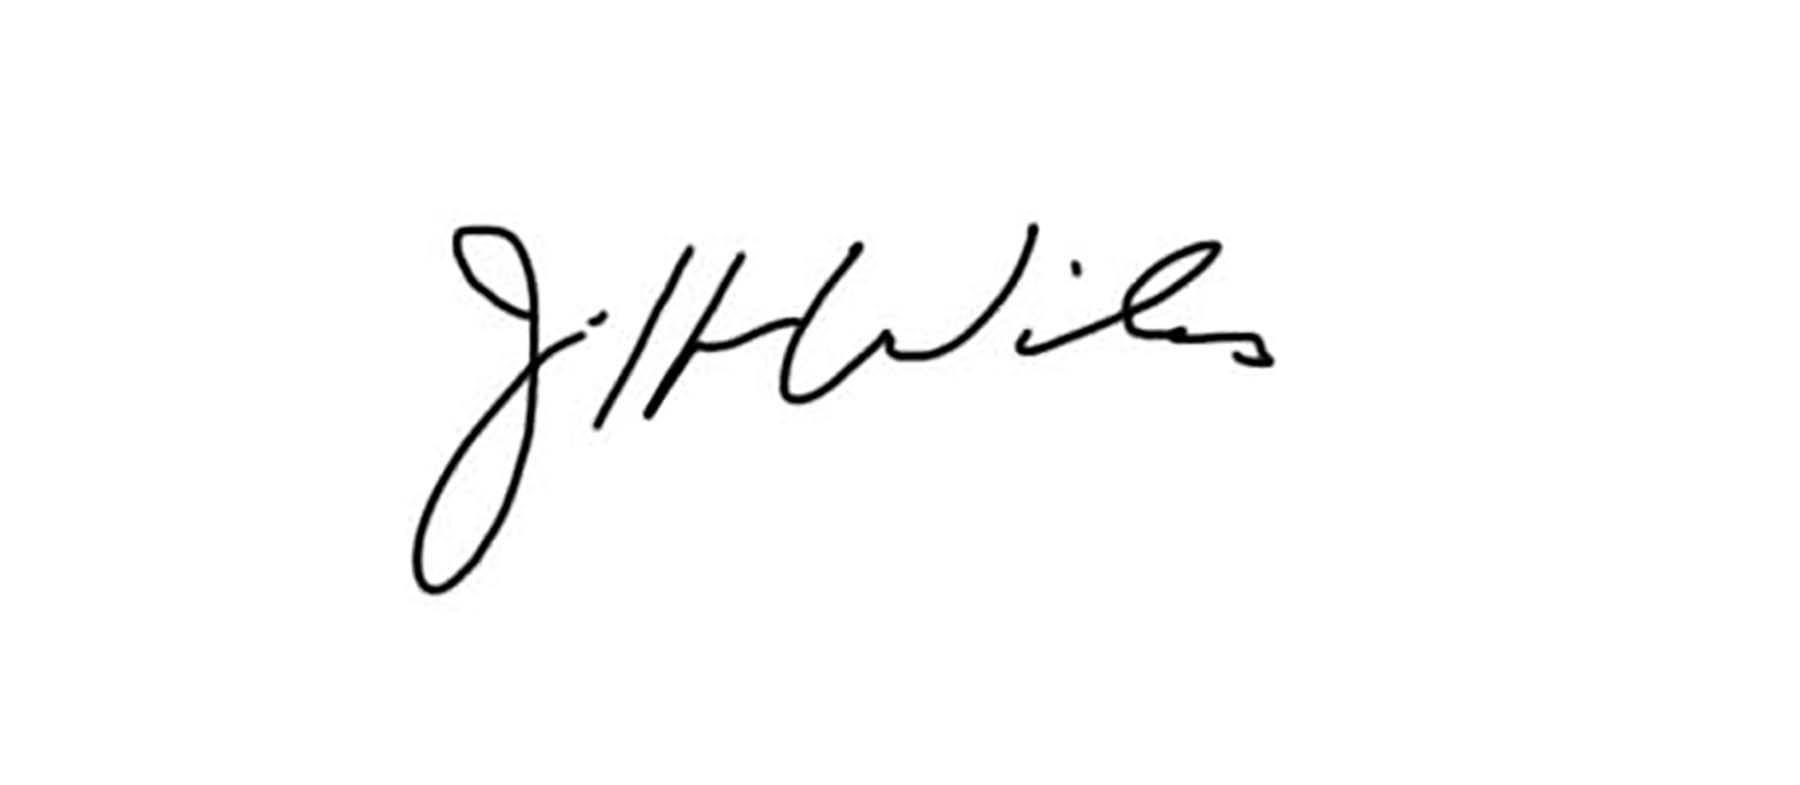 Jeff WILES Signature